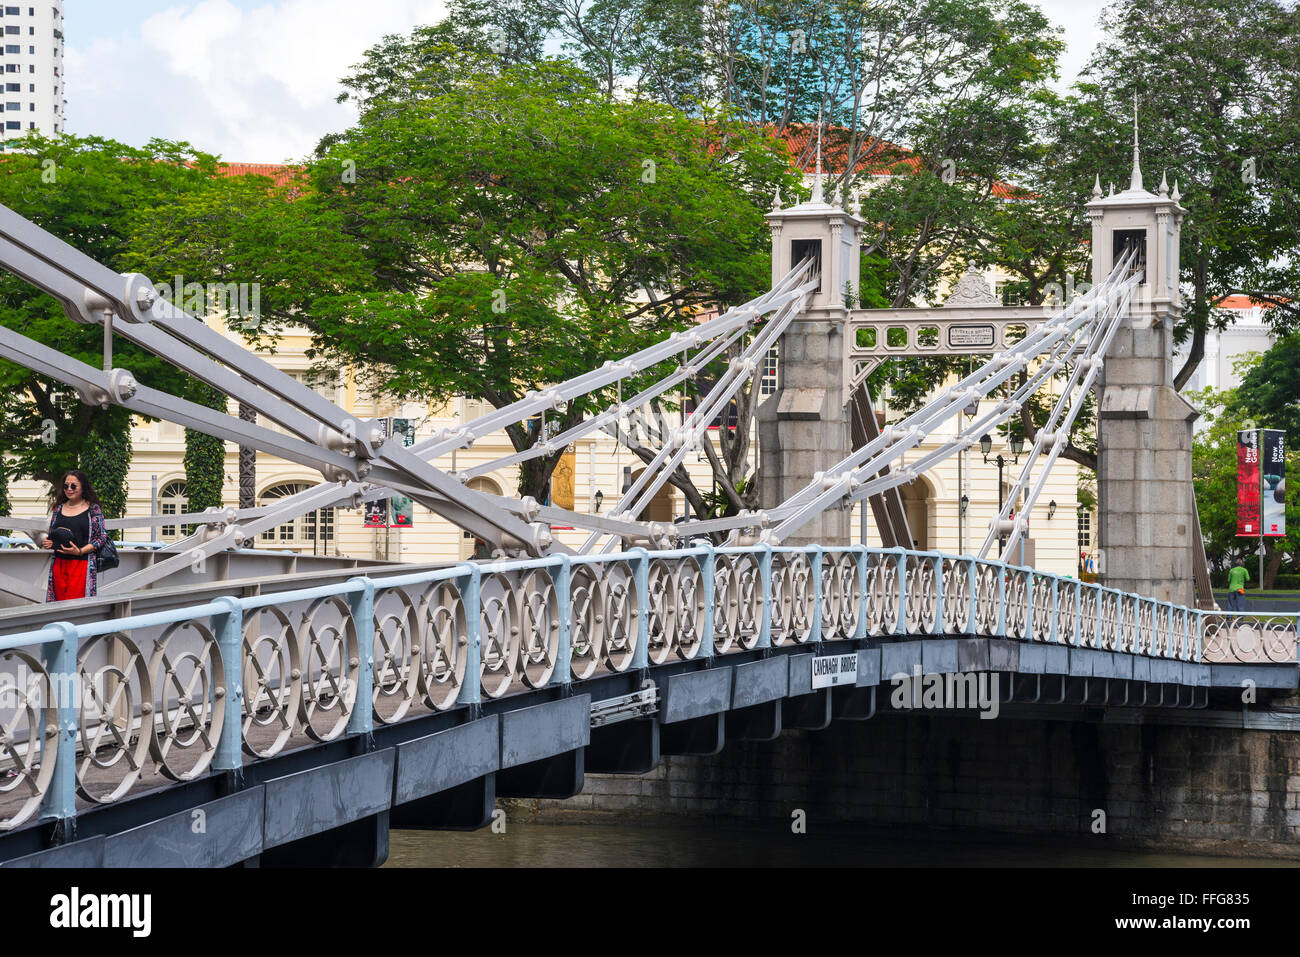 The Cavenagh Bridge, Singapore - Stock Image